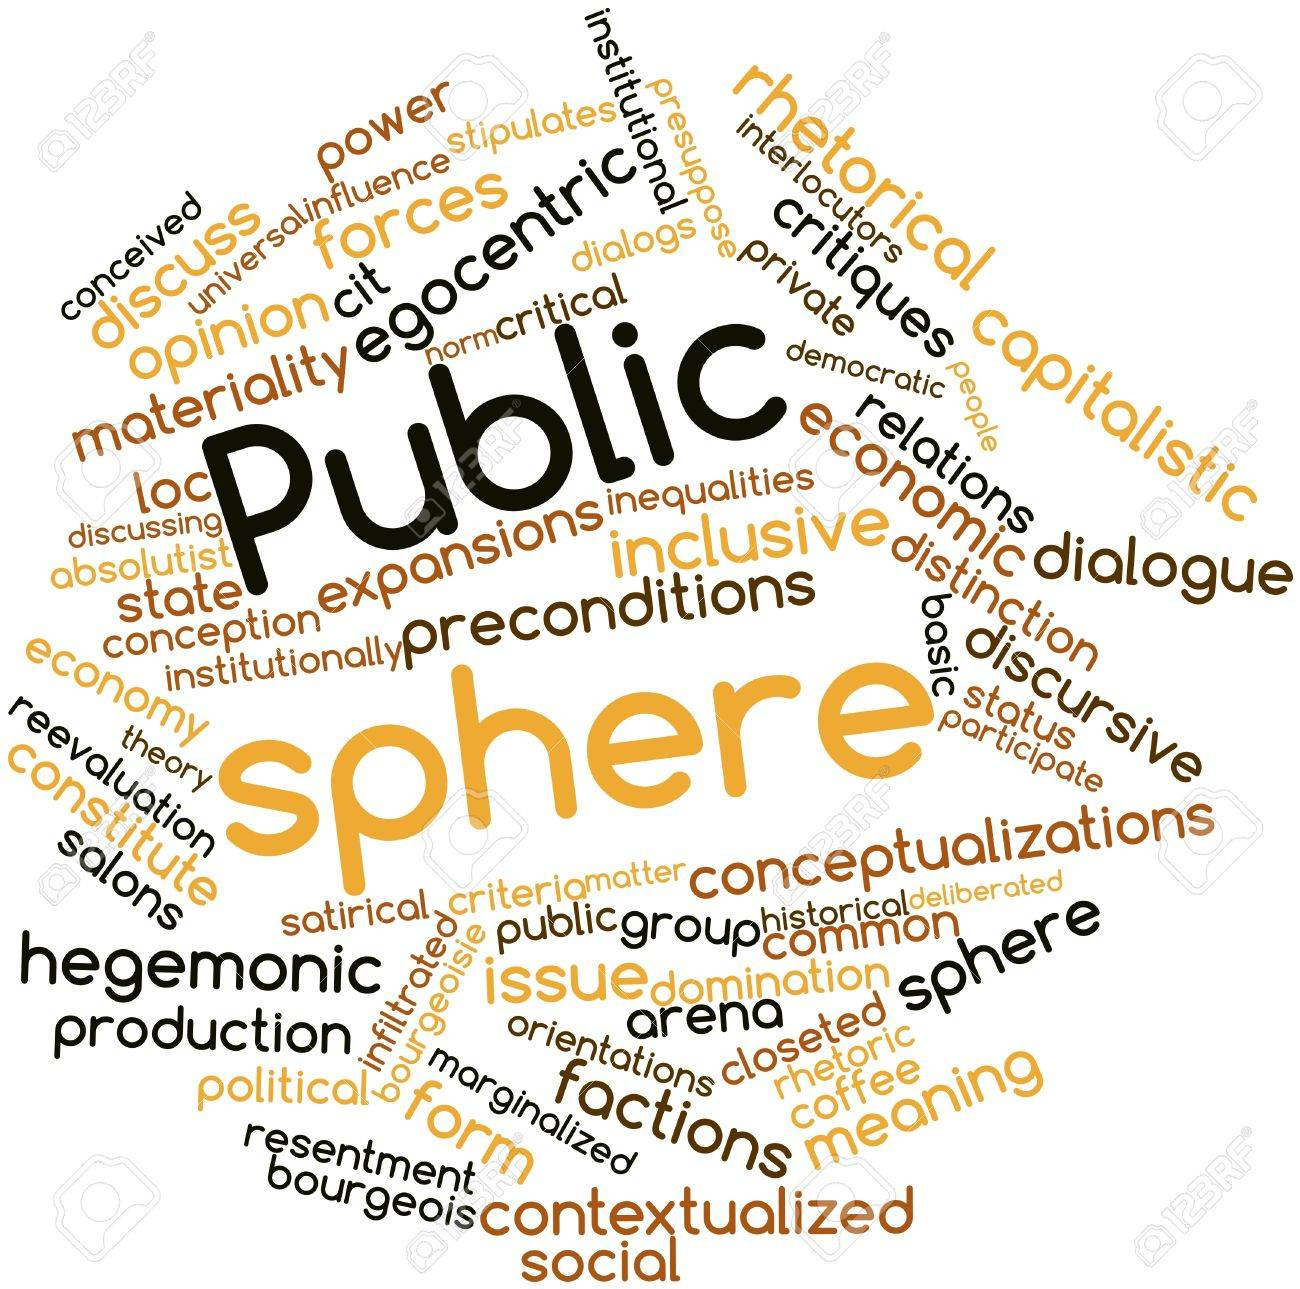 Image result for public sphere